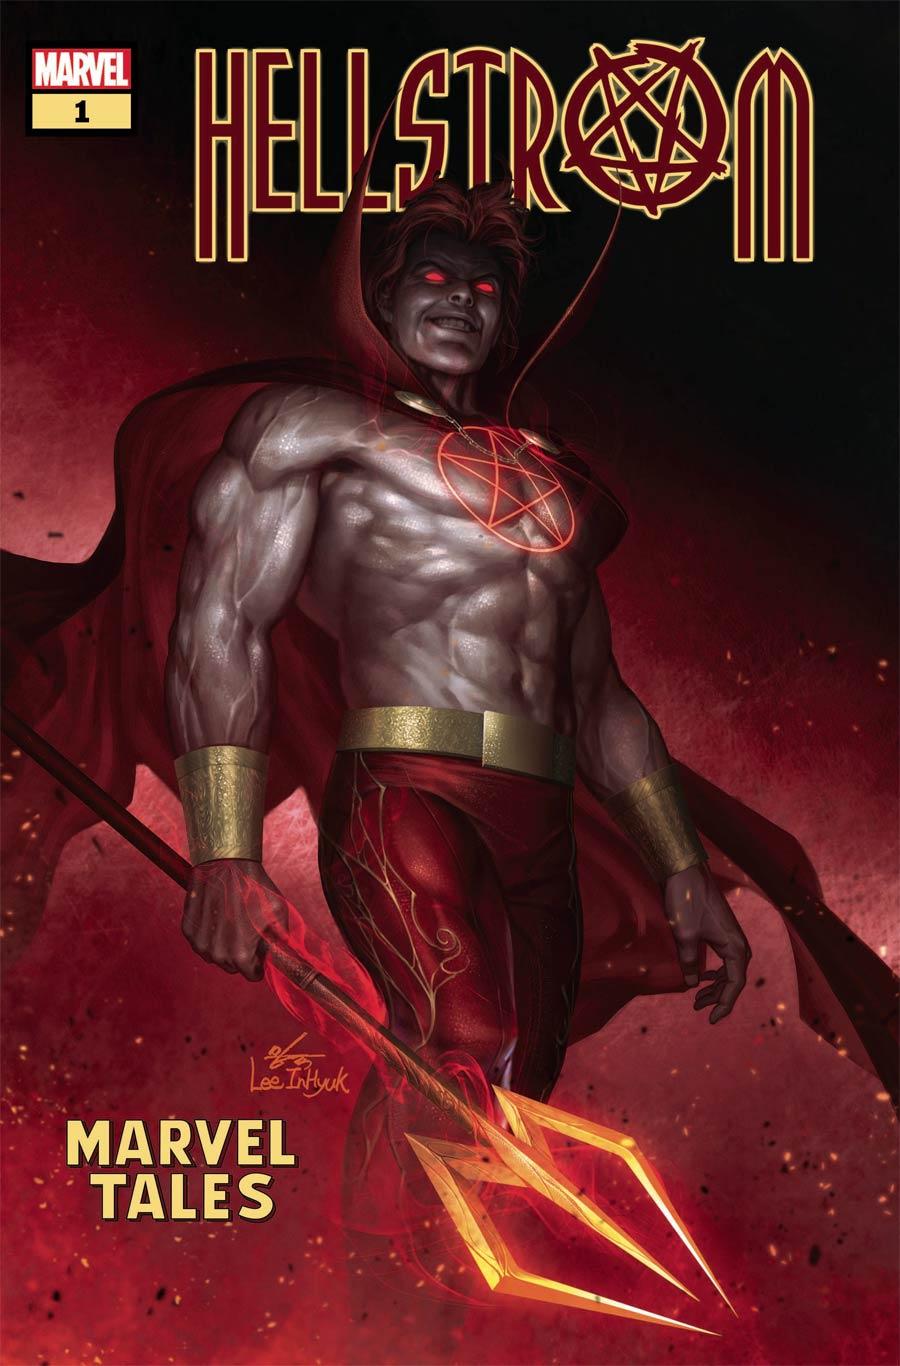 Hellstrom Marvel Tales #1 Cover A Regular Inhyuk Lee Cover